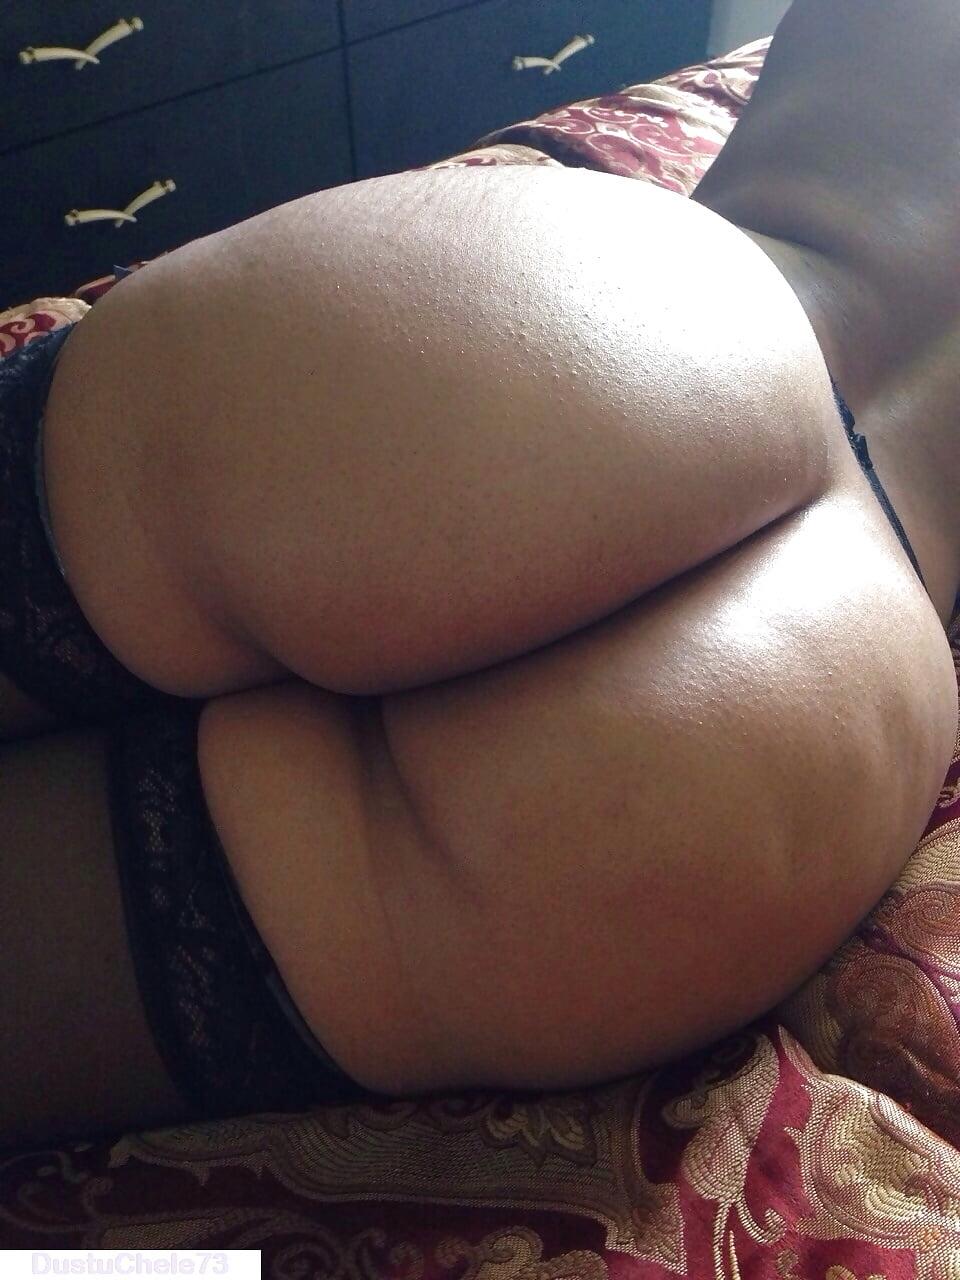 English girl with massive rack